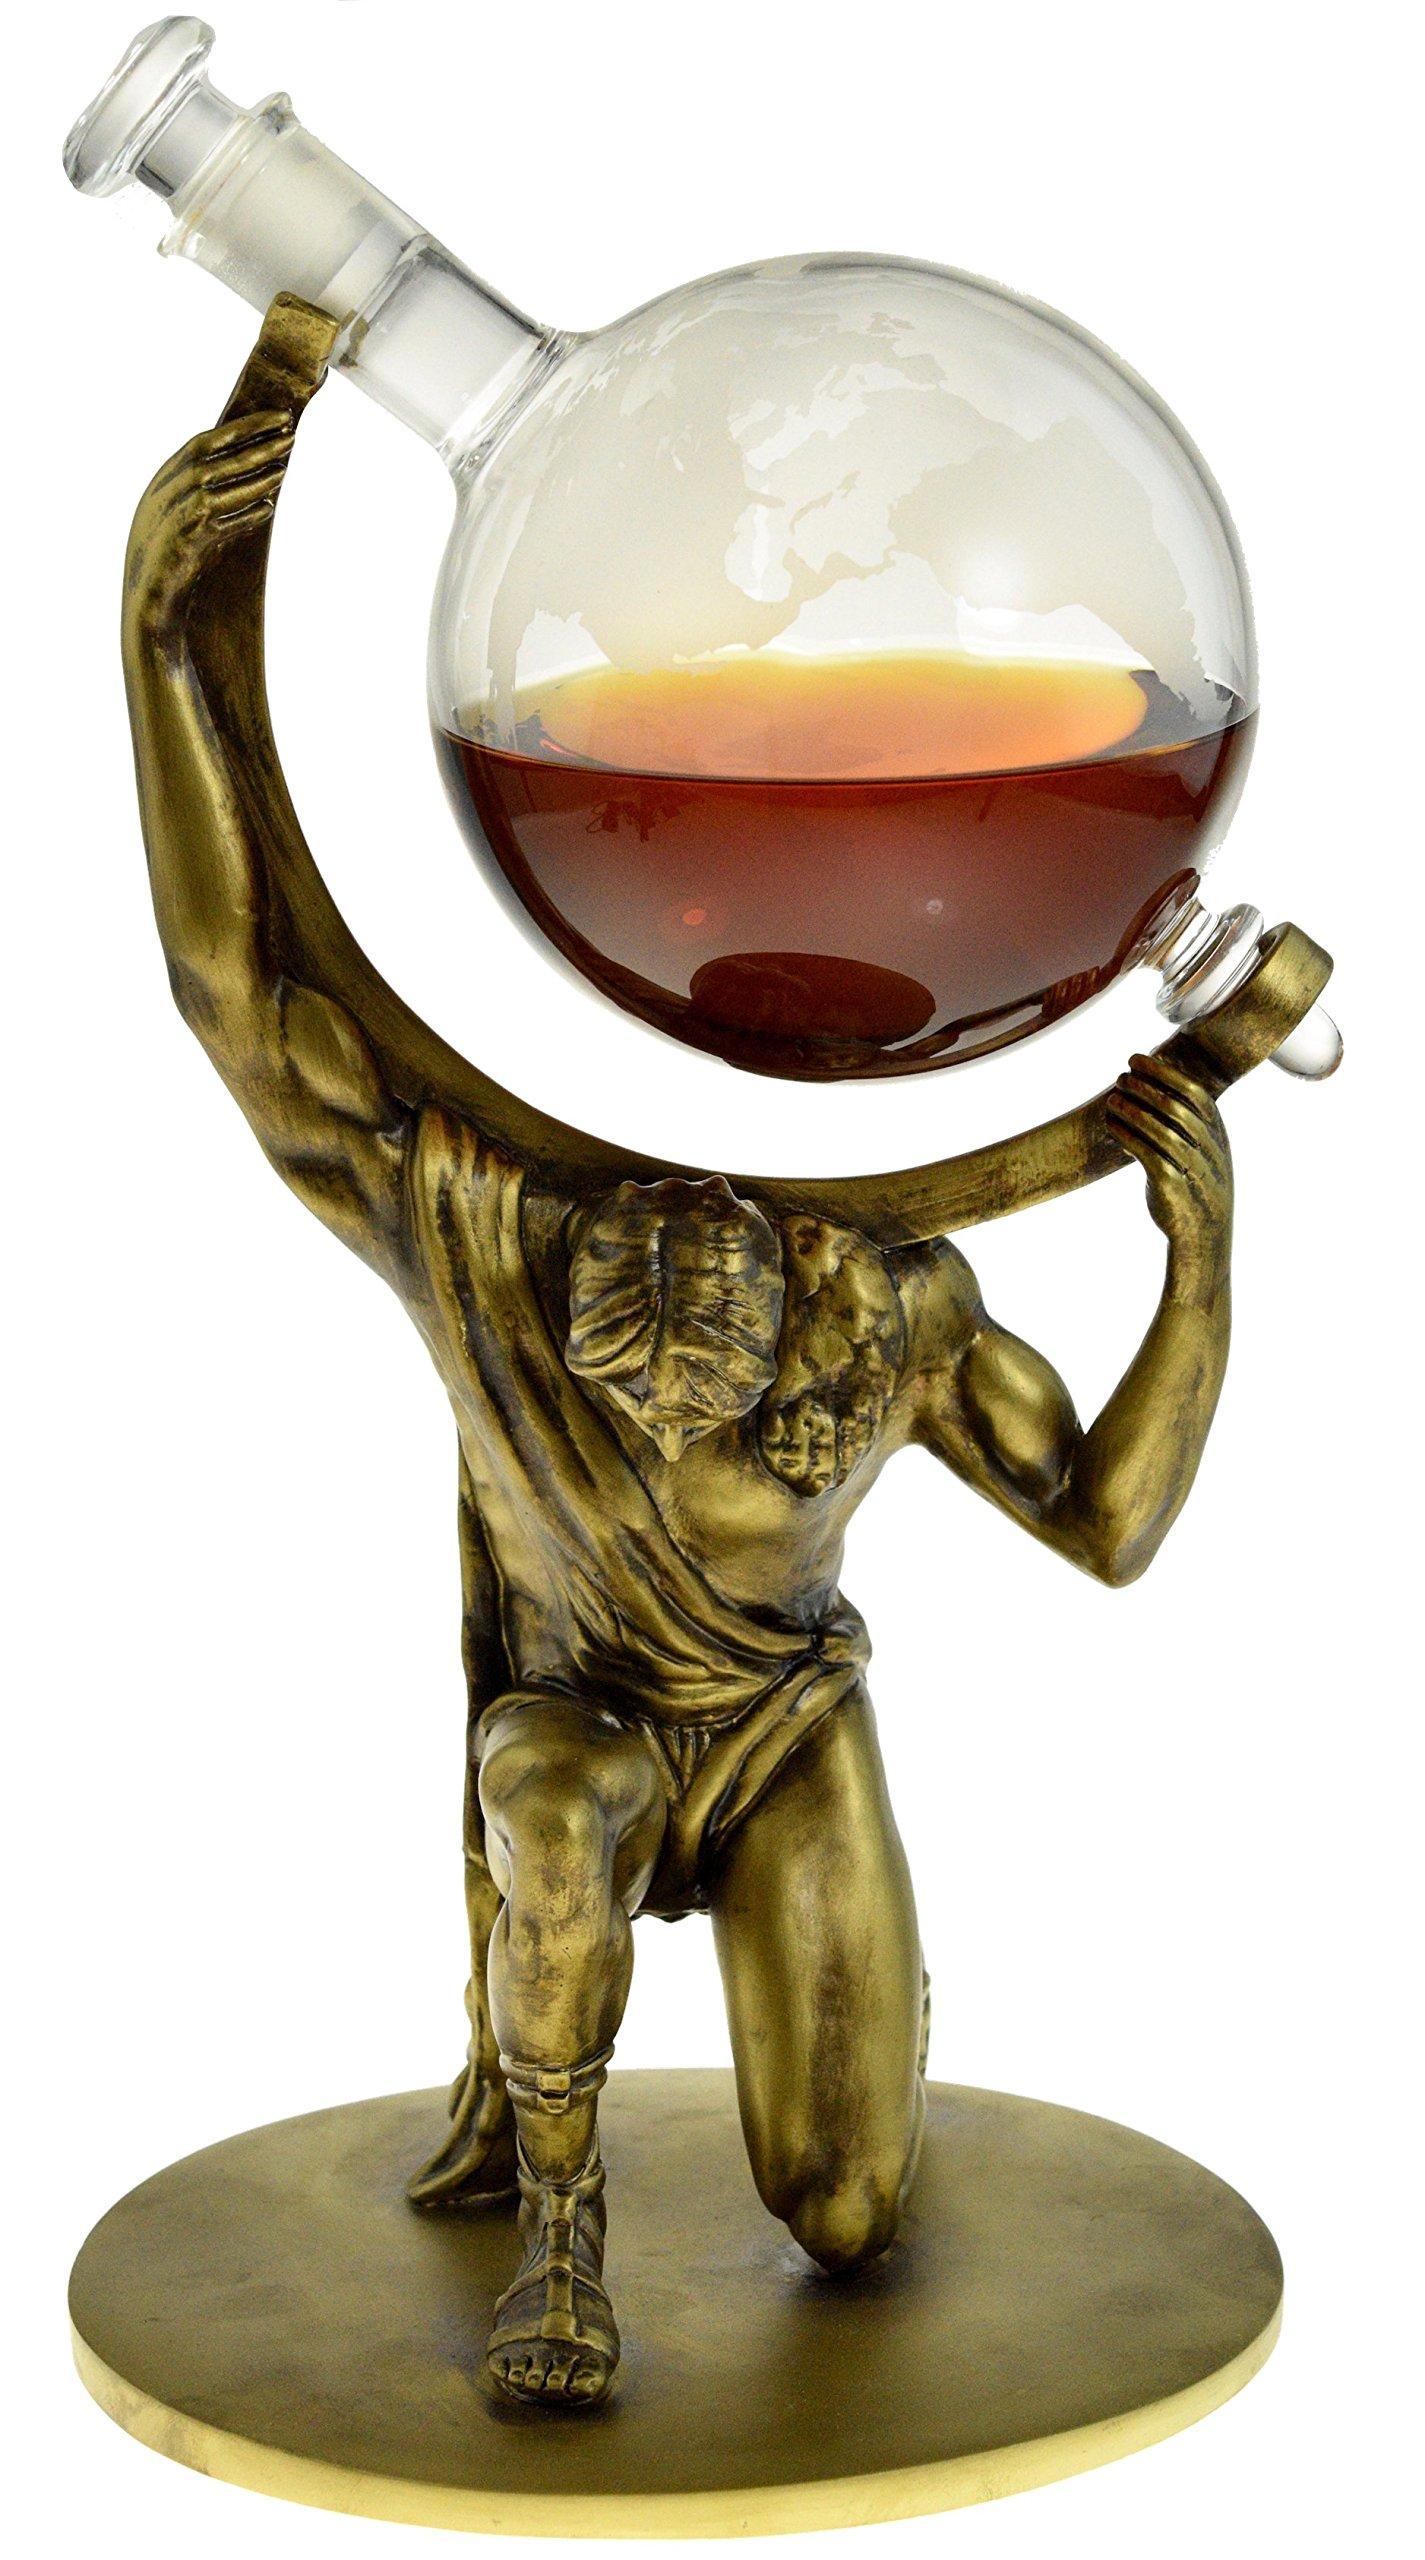 Atlas Etched Globe Liquor Decanter - Scotch Whiskey Decanter - 1000ml Glass Decanter With Atlas Base - Vodka, Bourbon, Rum, Wine, Tequila (Atlas: Bearer of Worldly Spirits) Prestige Decanters